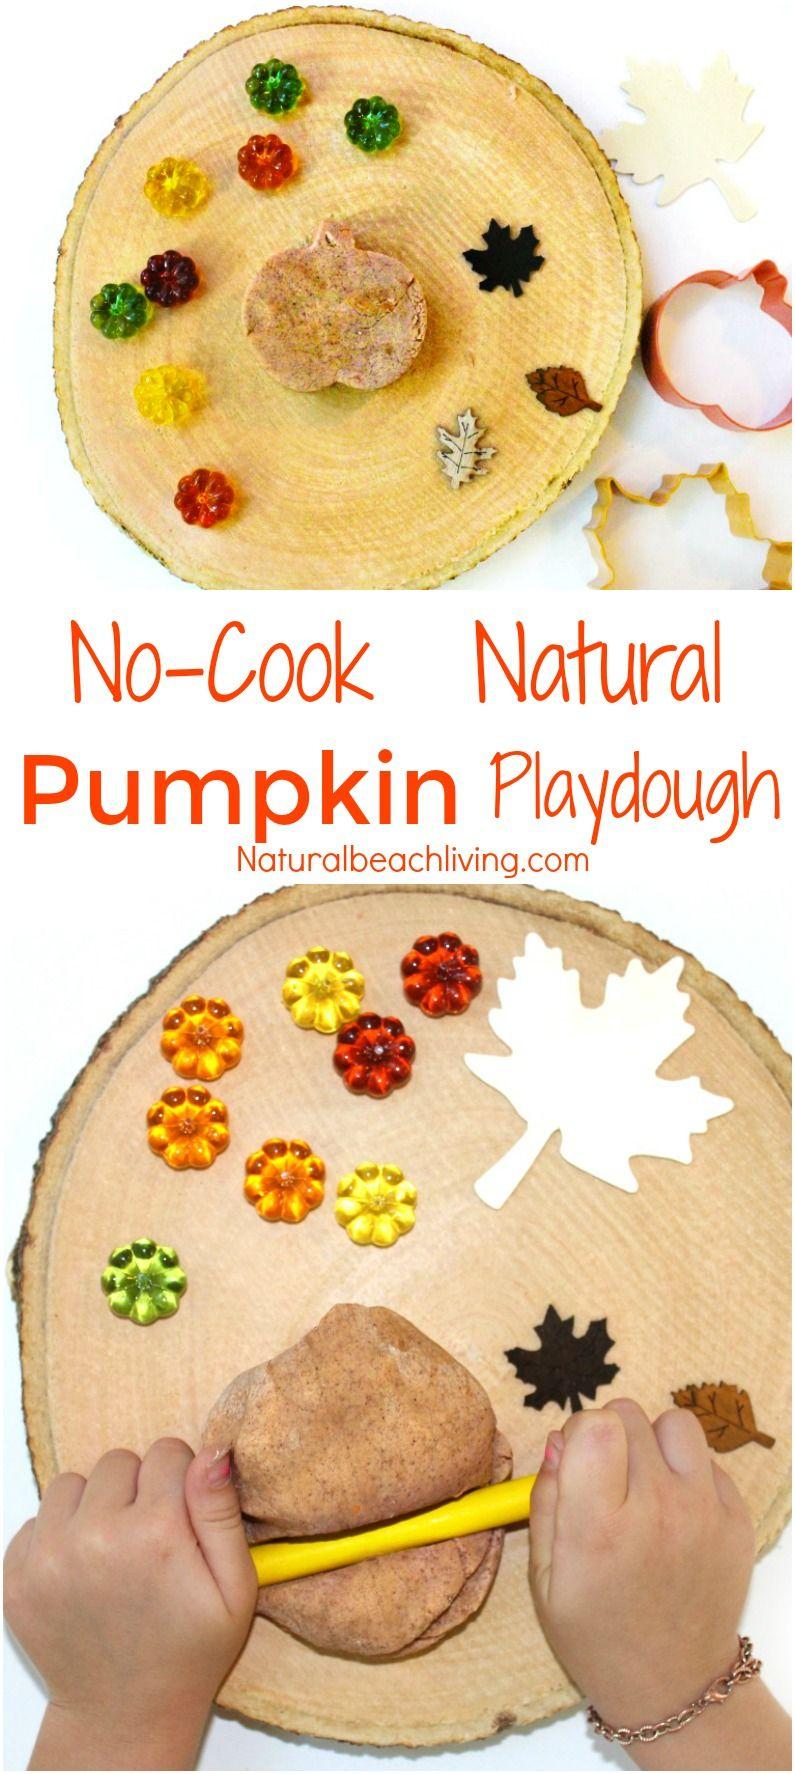 How to Make The Best Natural NoCook Pumpkin Playdough